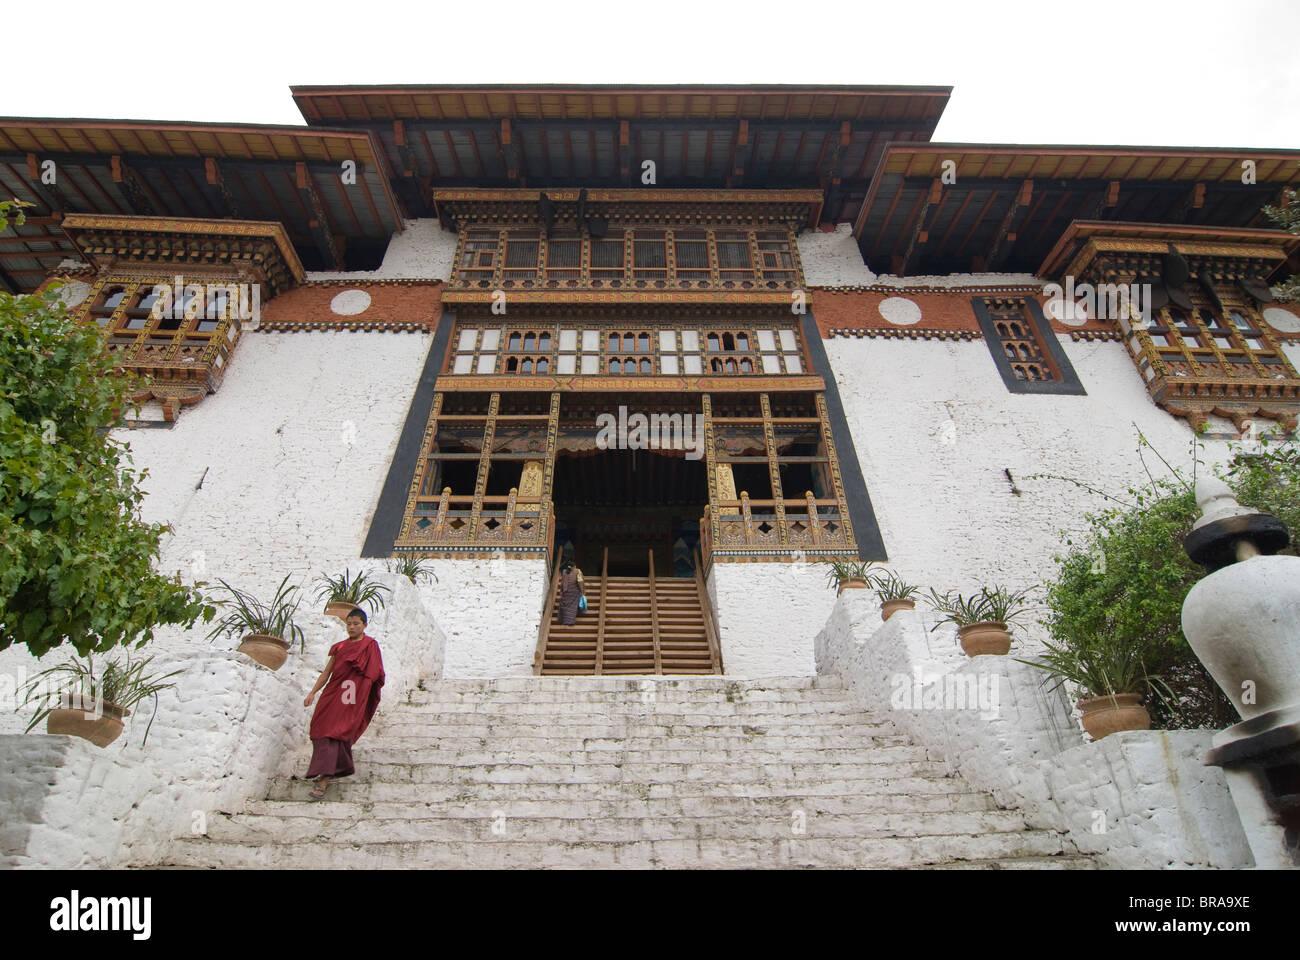 The tsong (old castle) of Punakha, Bhutan, Asia - Stock Image